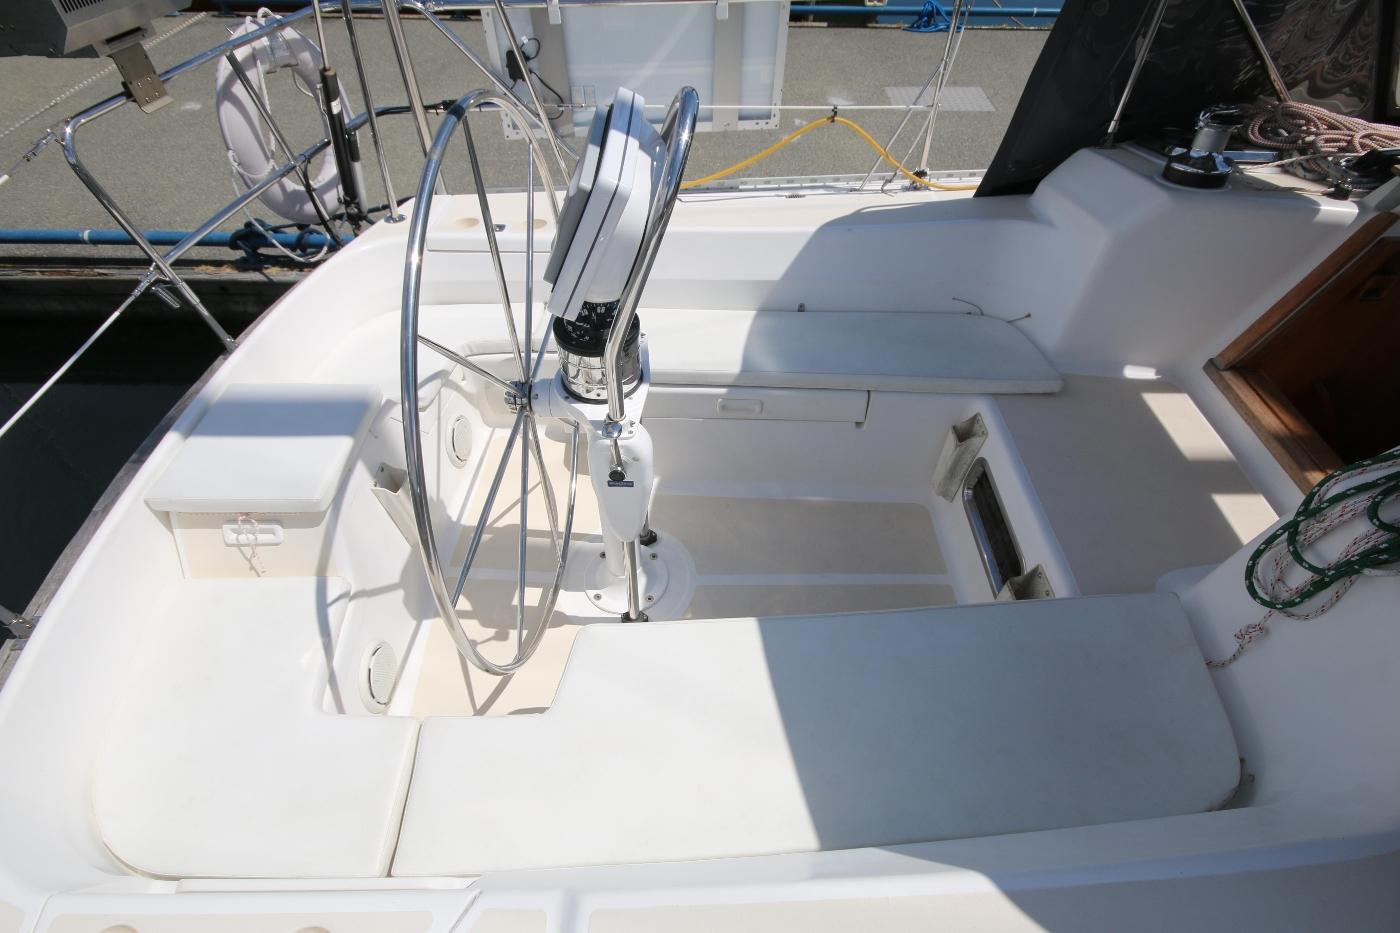 2003 Tartan 3700, Cockpit & Cushions